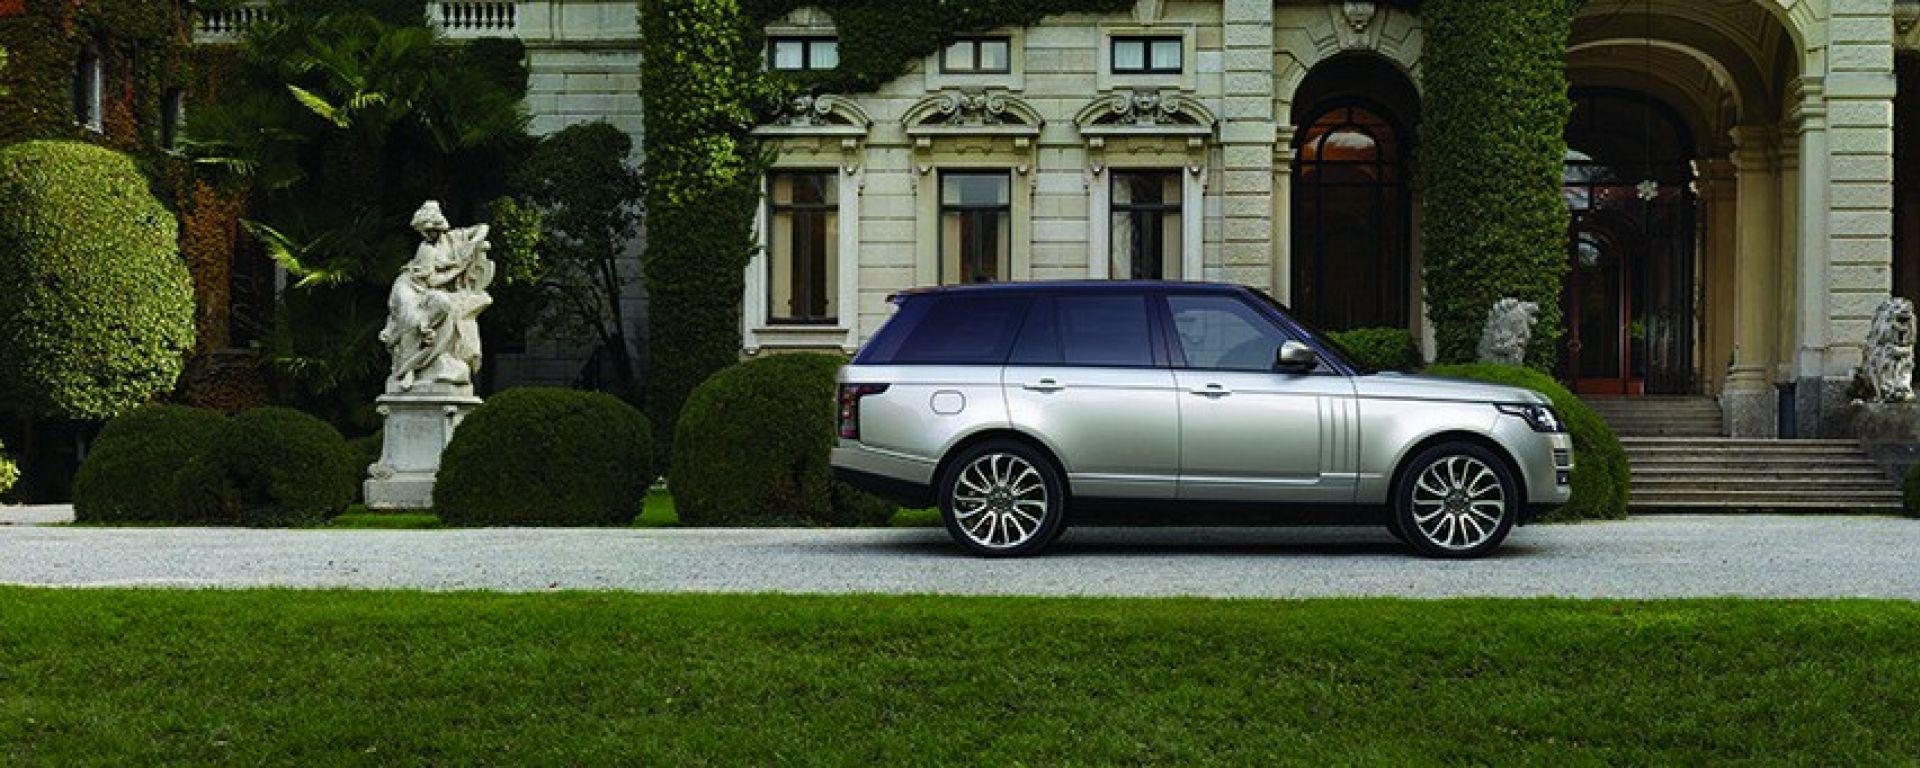 Range Rover Model Year 2017: punta sull'elettronica